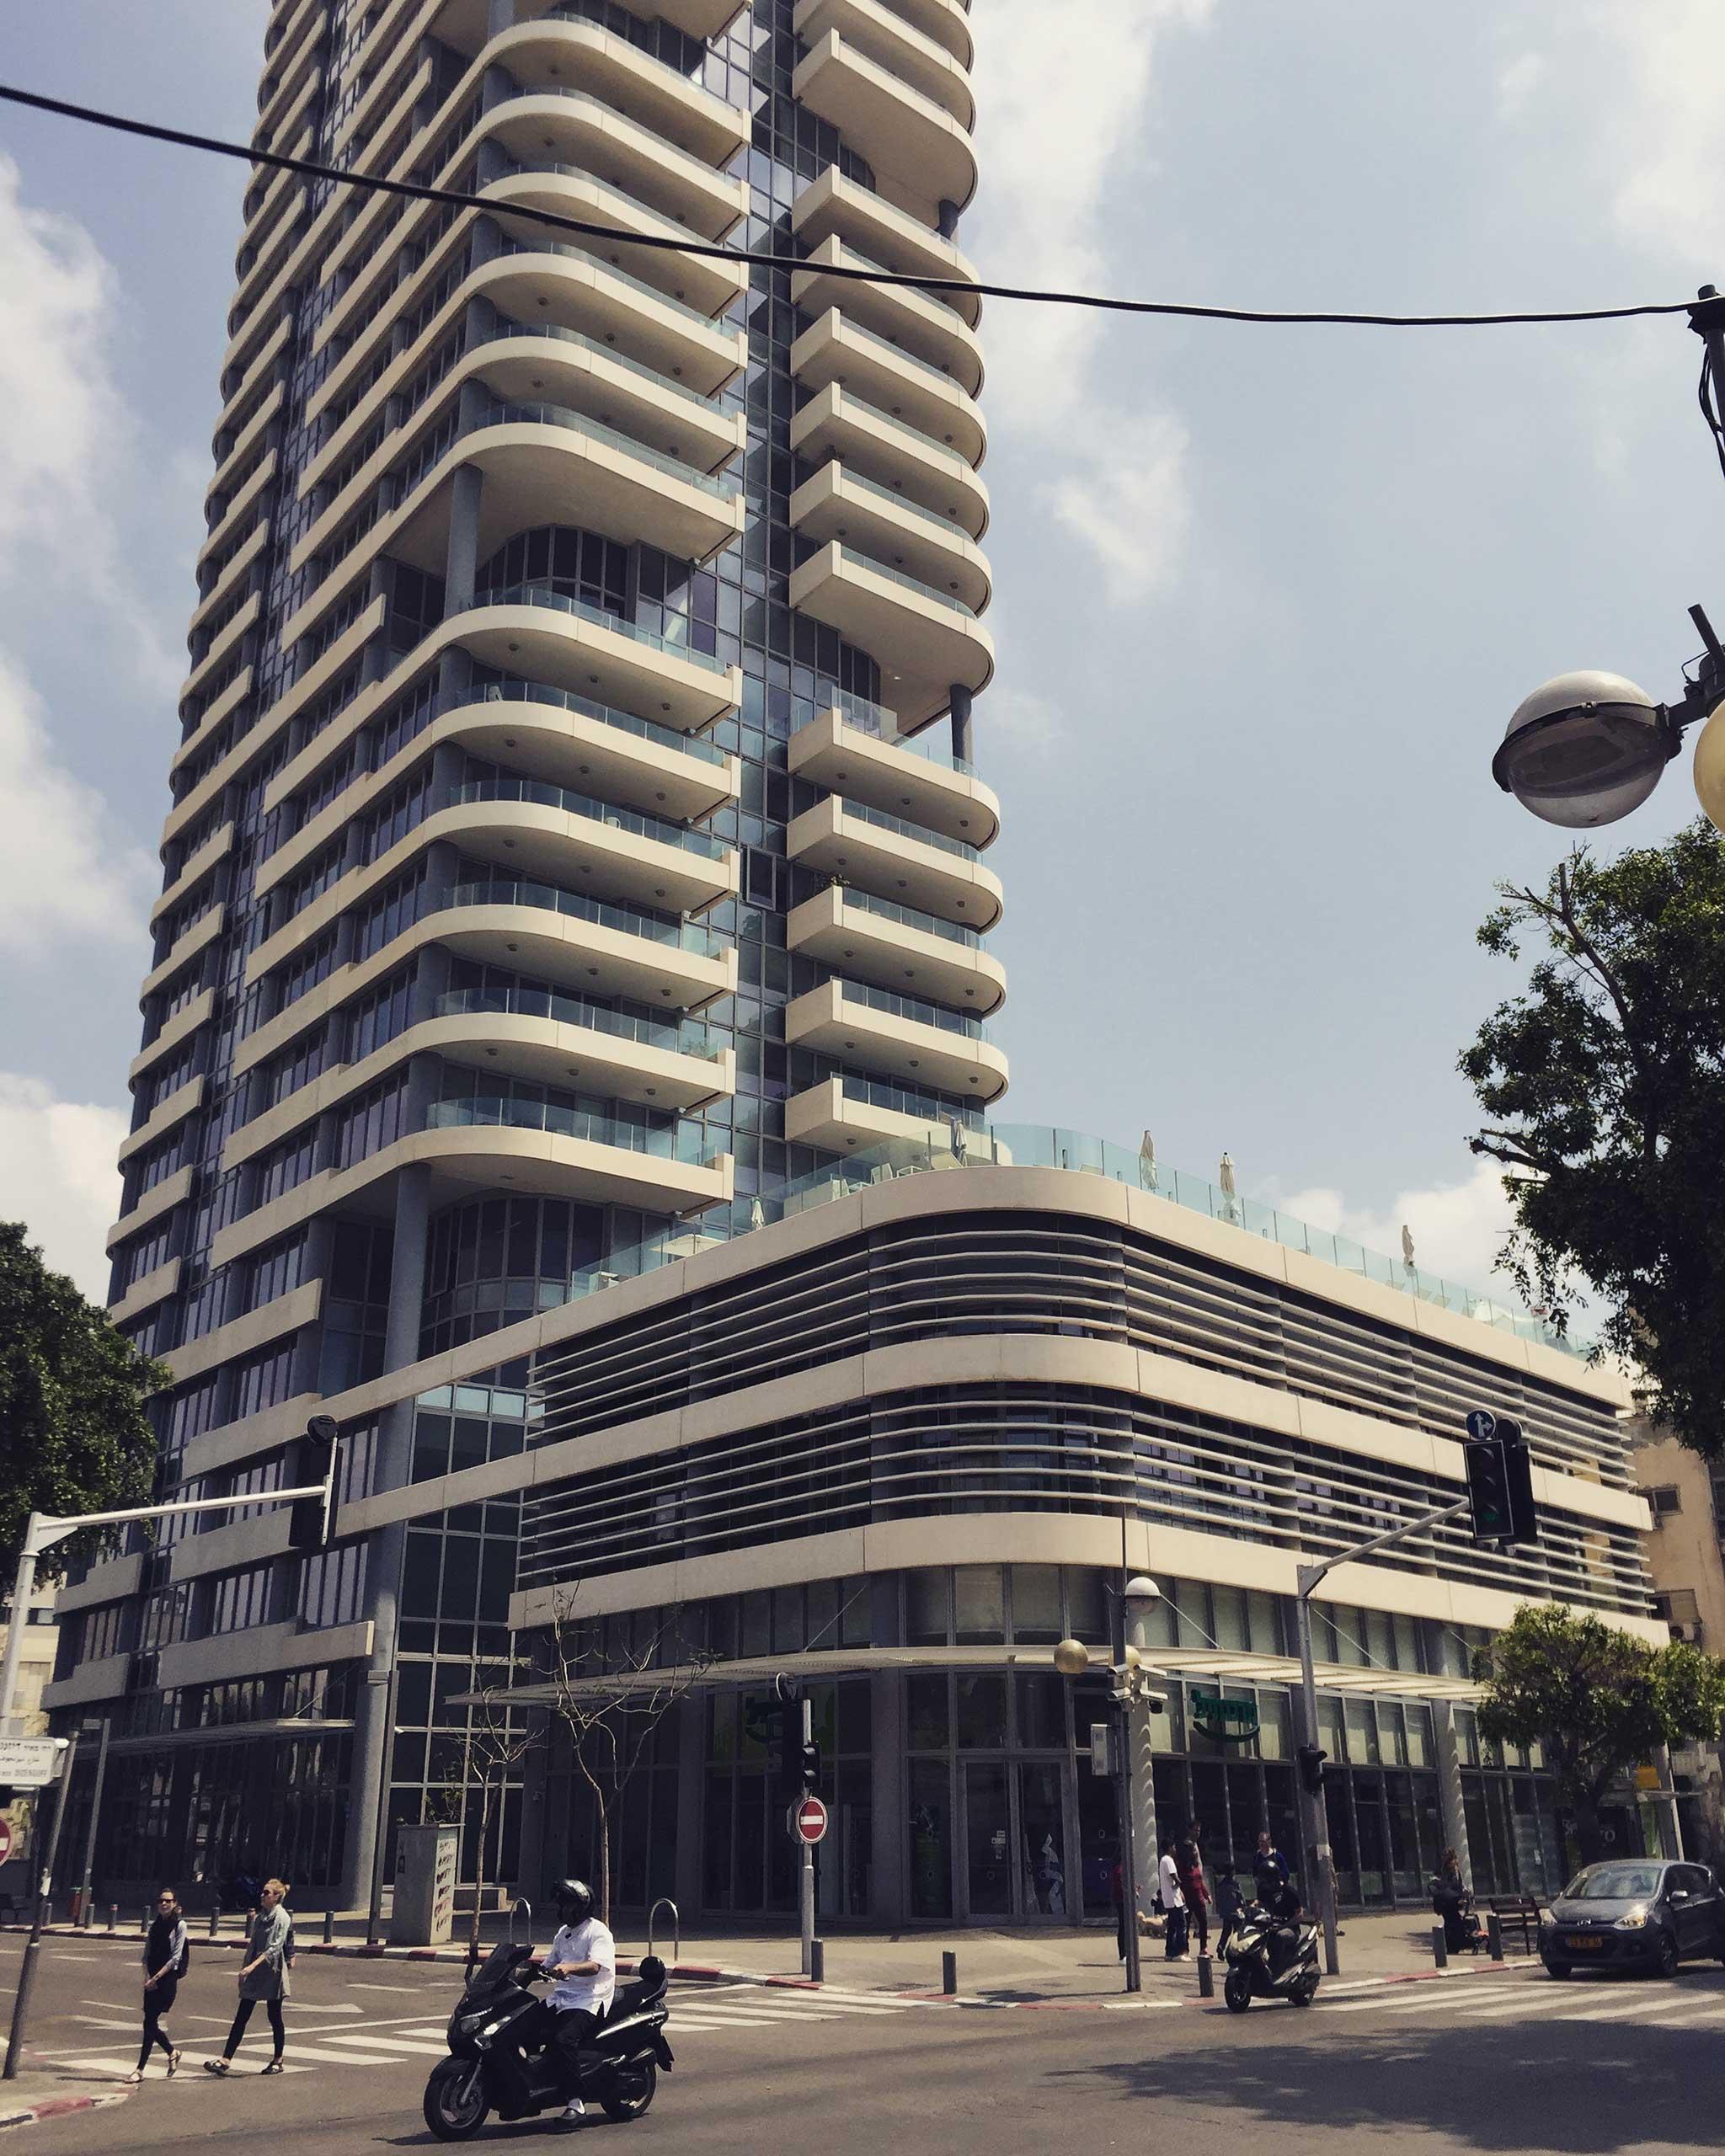 Frishman Tower on Tel Aviv audio tour The White City